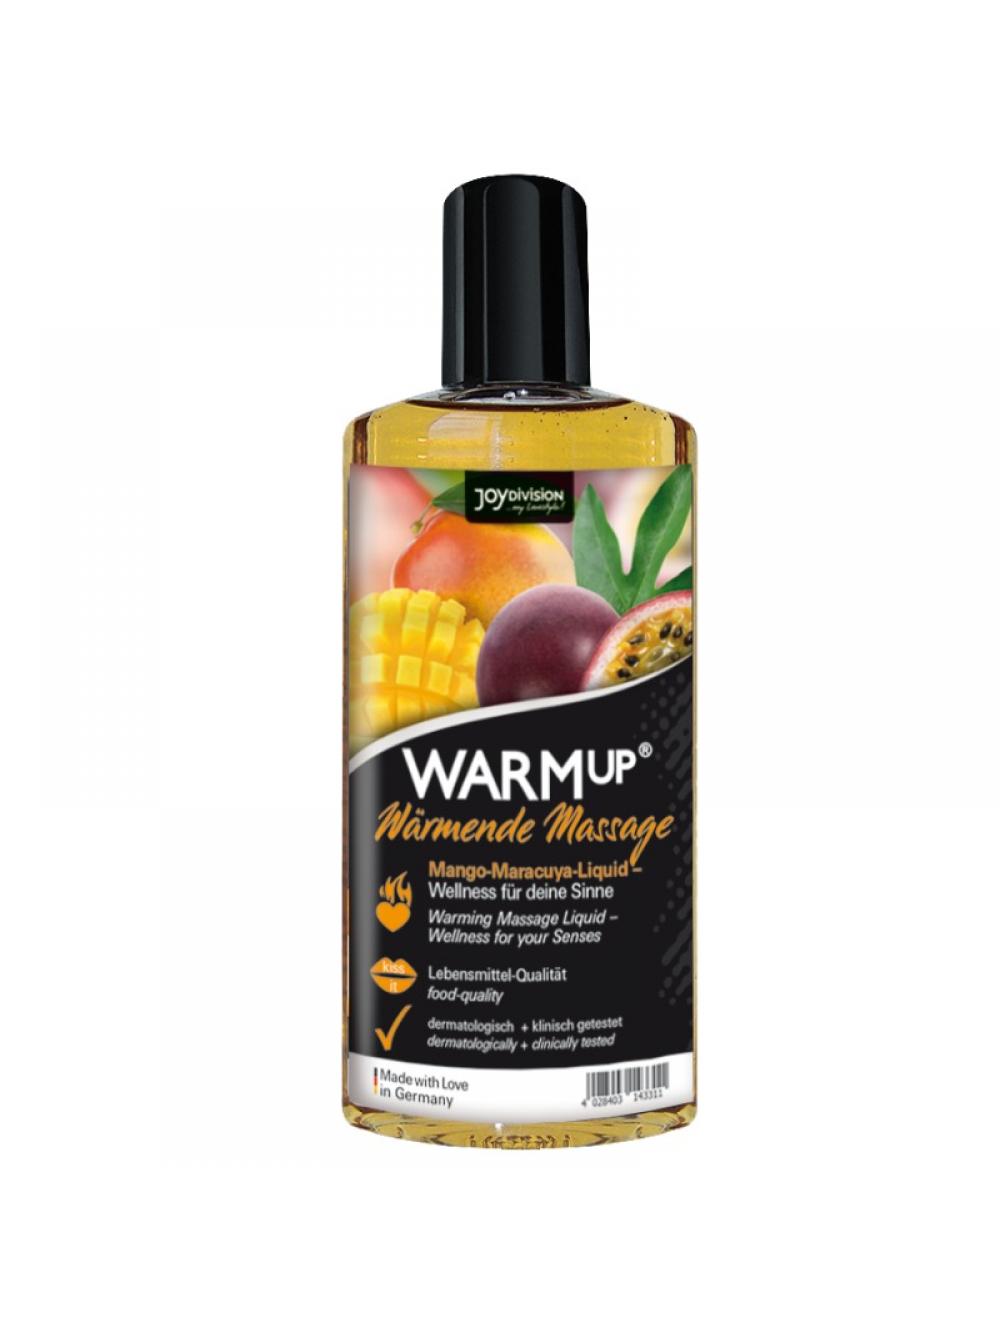 WARMUP MANGO AND MARACUYA MASSAGE OIL 150 ML